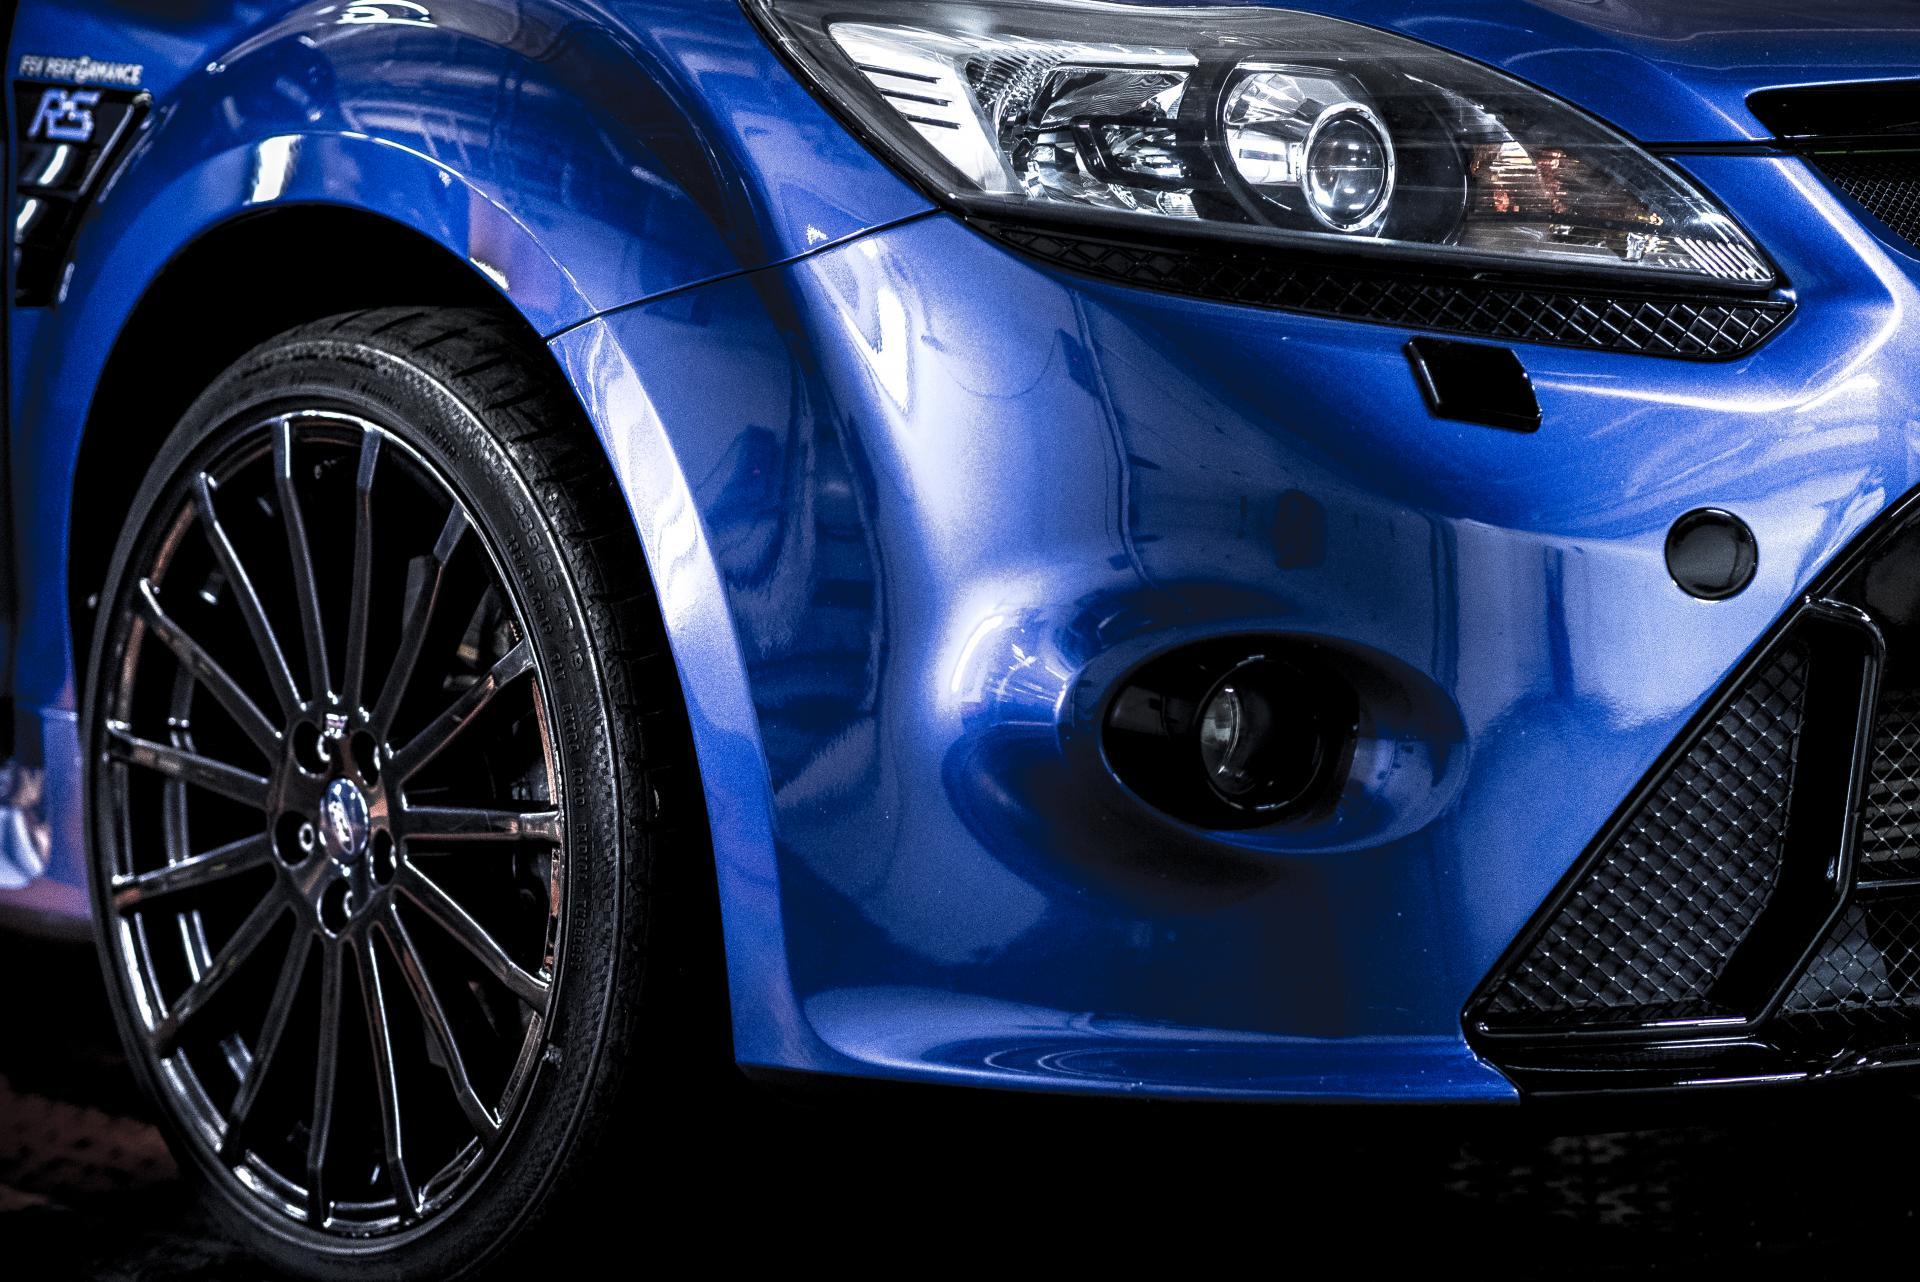 Ford Focus II RS - zadzior zer stanów detal